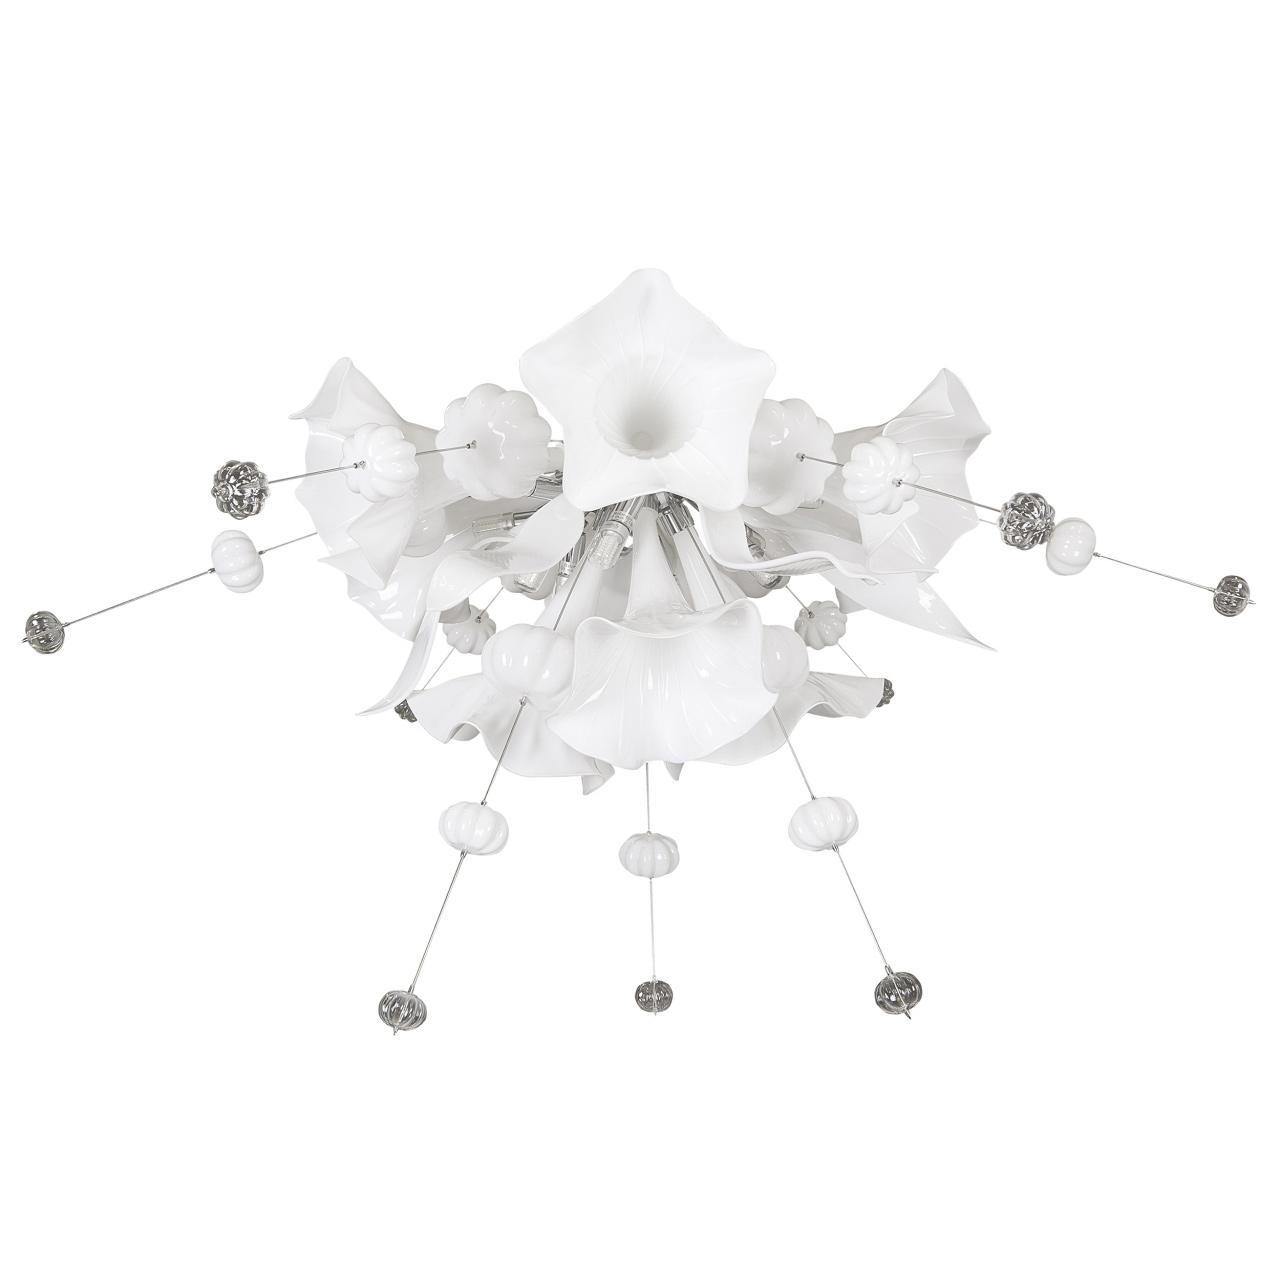 Люстра потолочная Celesta 12х6W (Led) G9 чисто белый Lightstar 893026